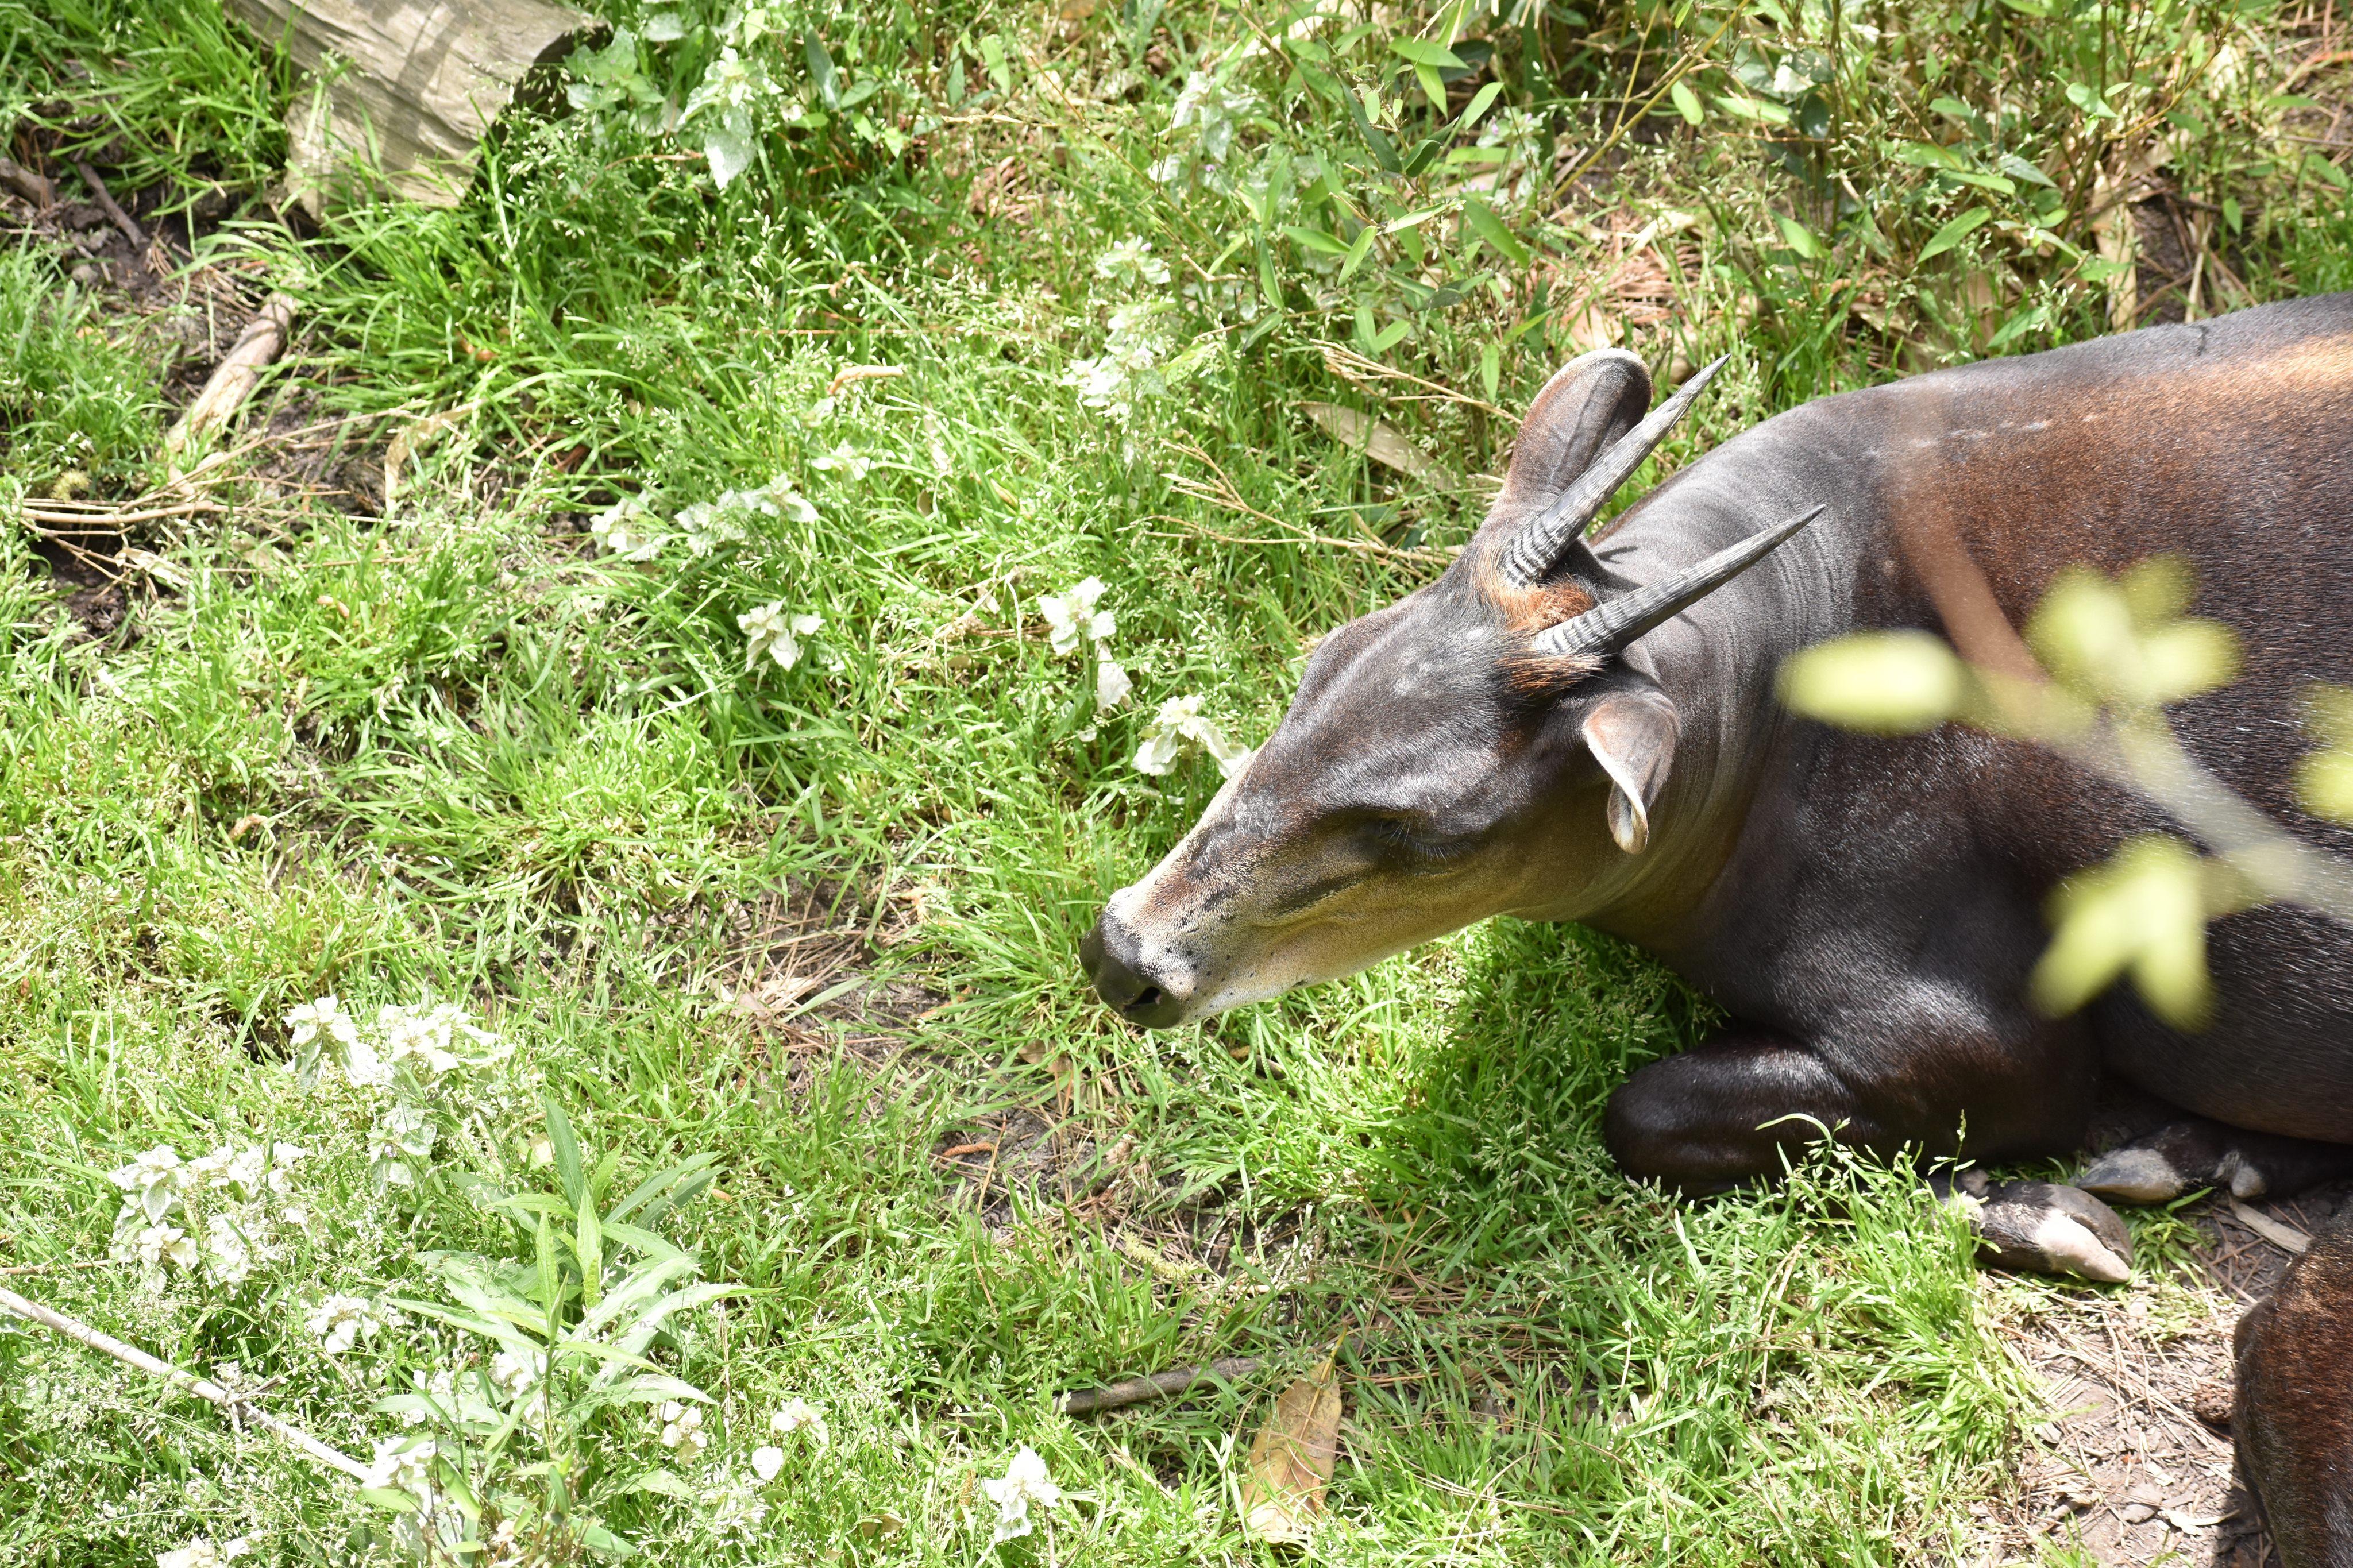 offset duiker laying in grass